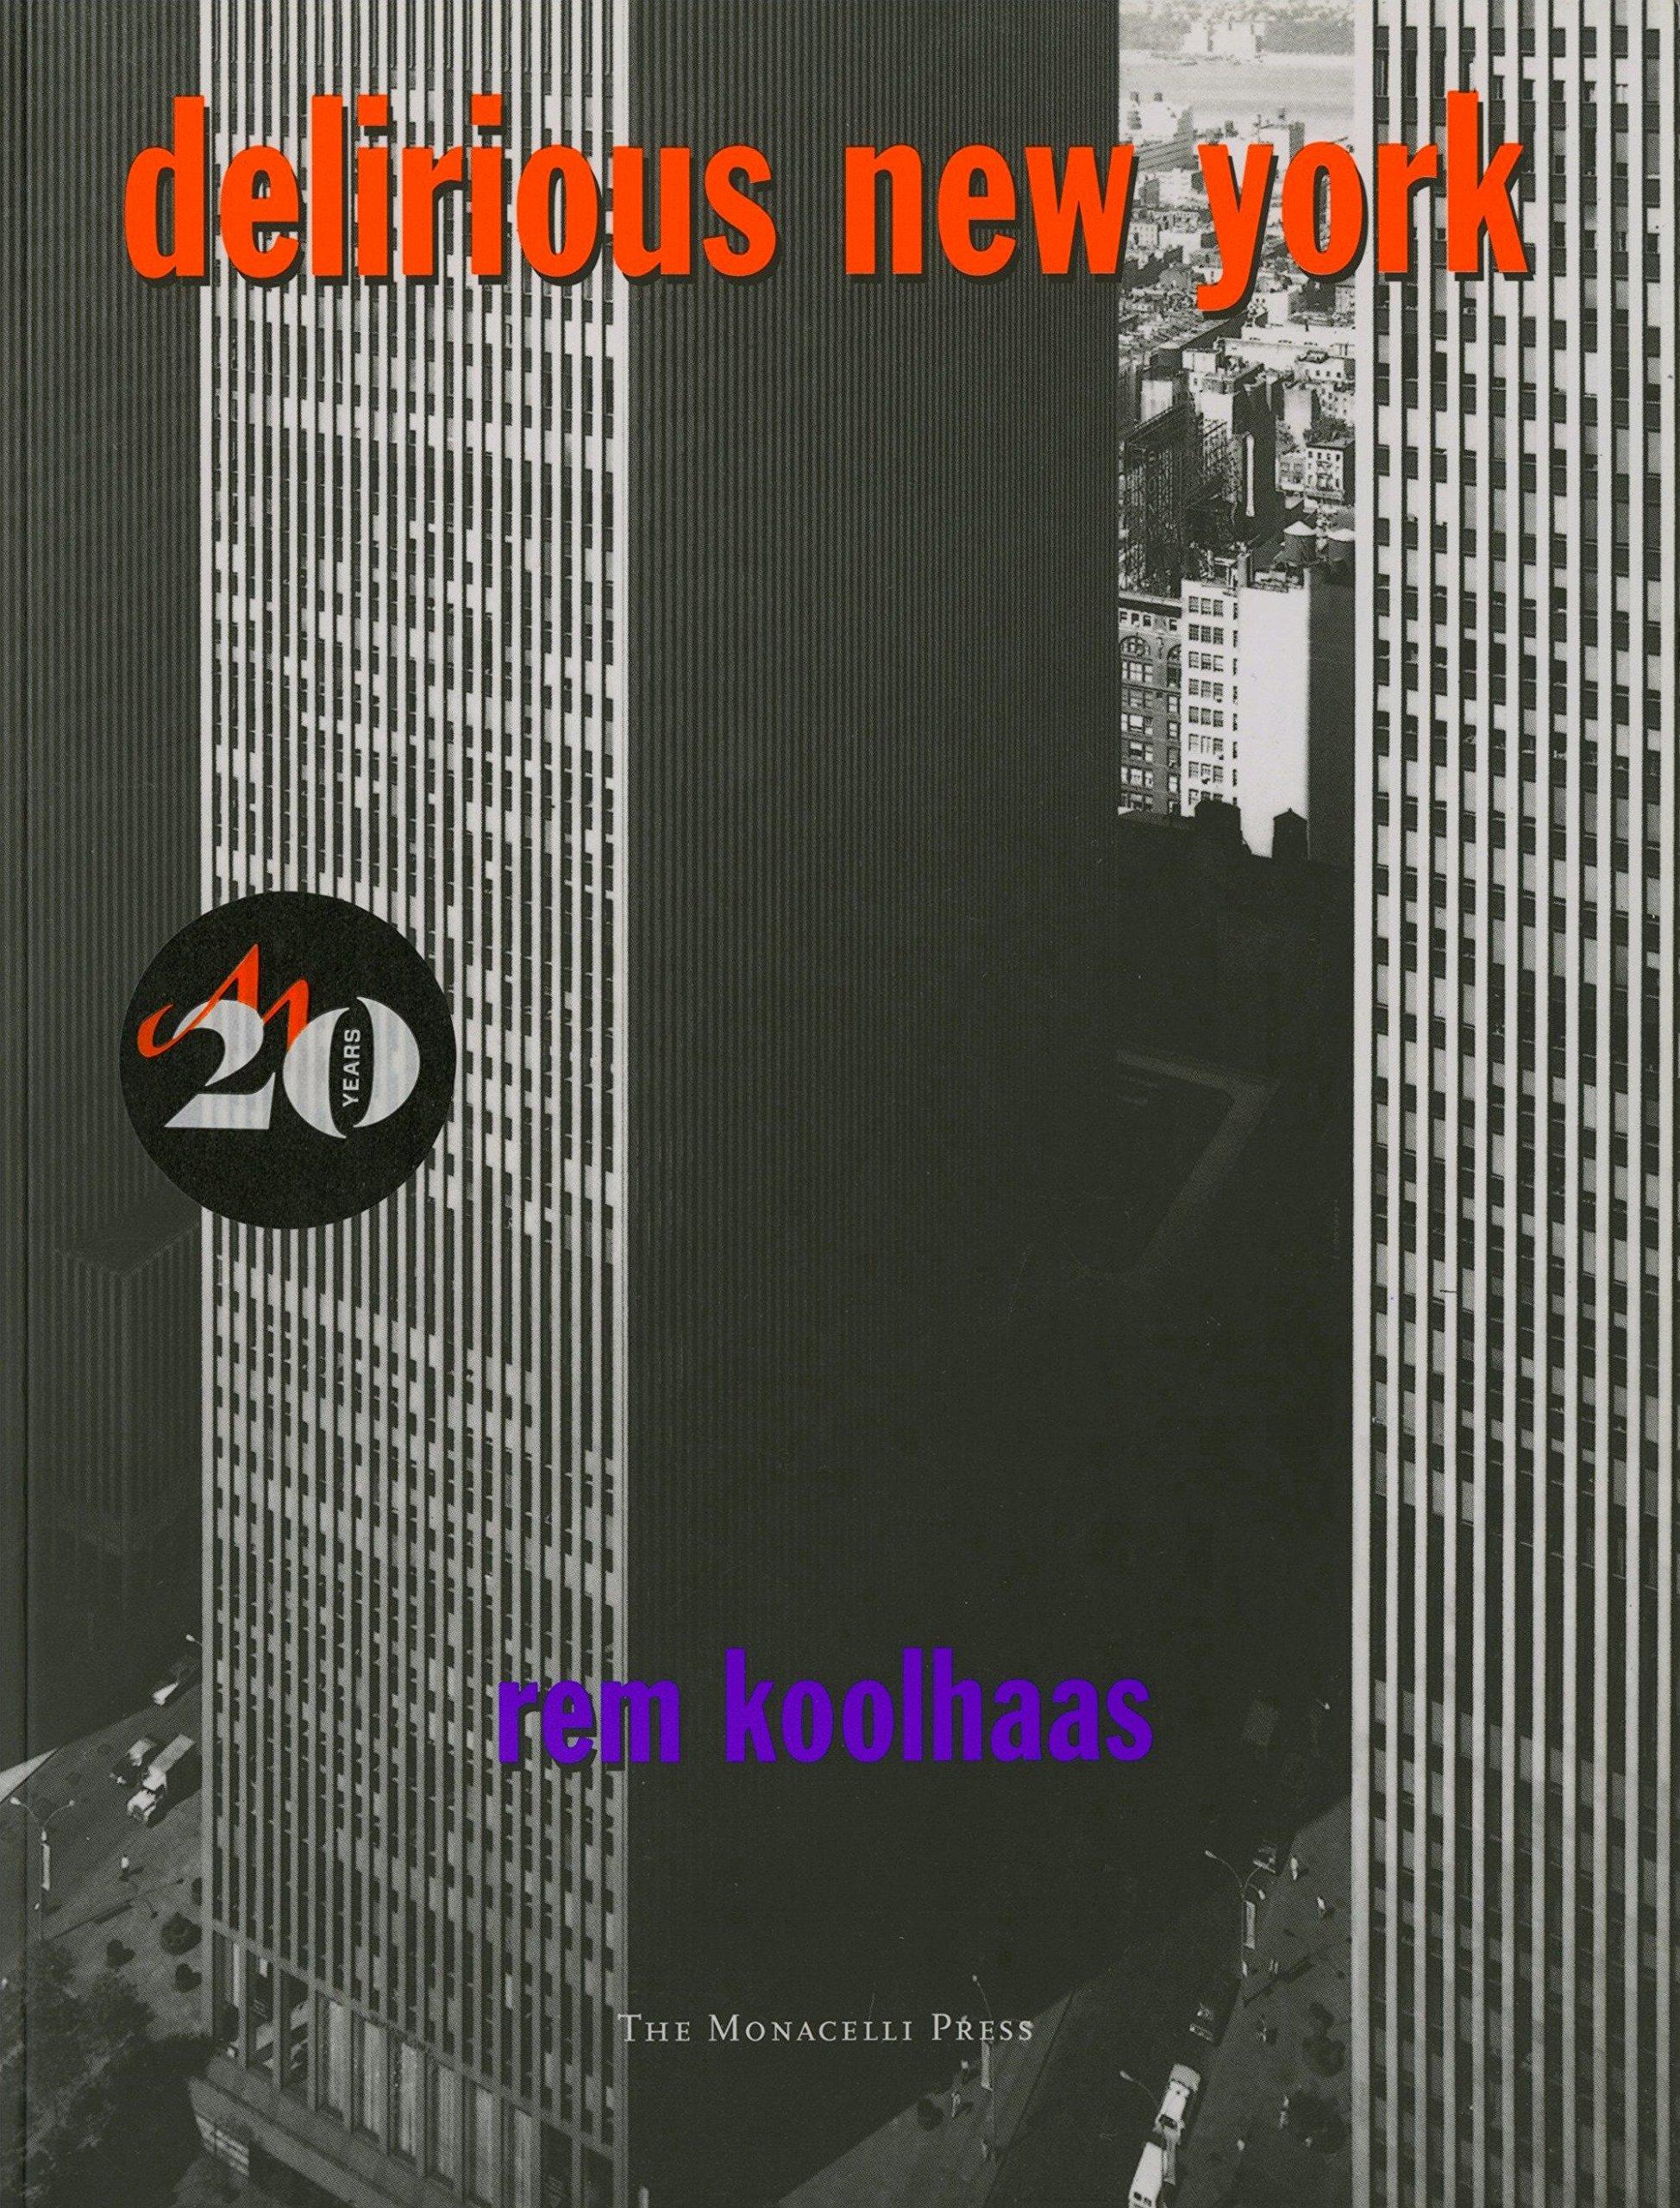 Delirious New York: A Retroactive Manifesto for Manhattan Paperback – December 1, 1997 Rem Koolhaas The Monacelli Press 1885254008 Buildings - Public